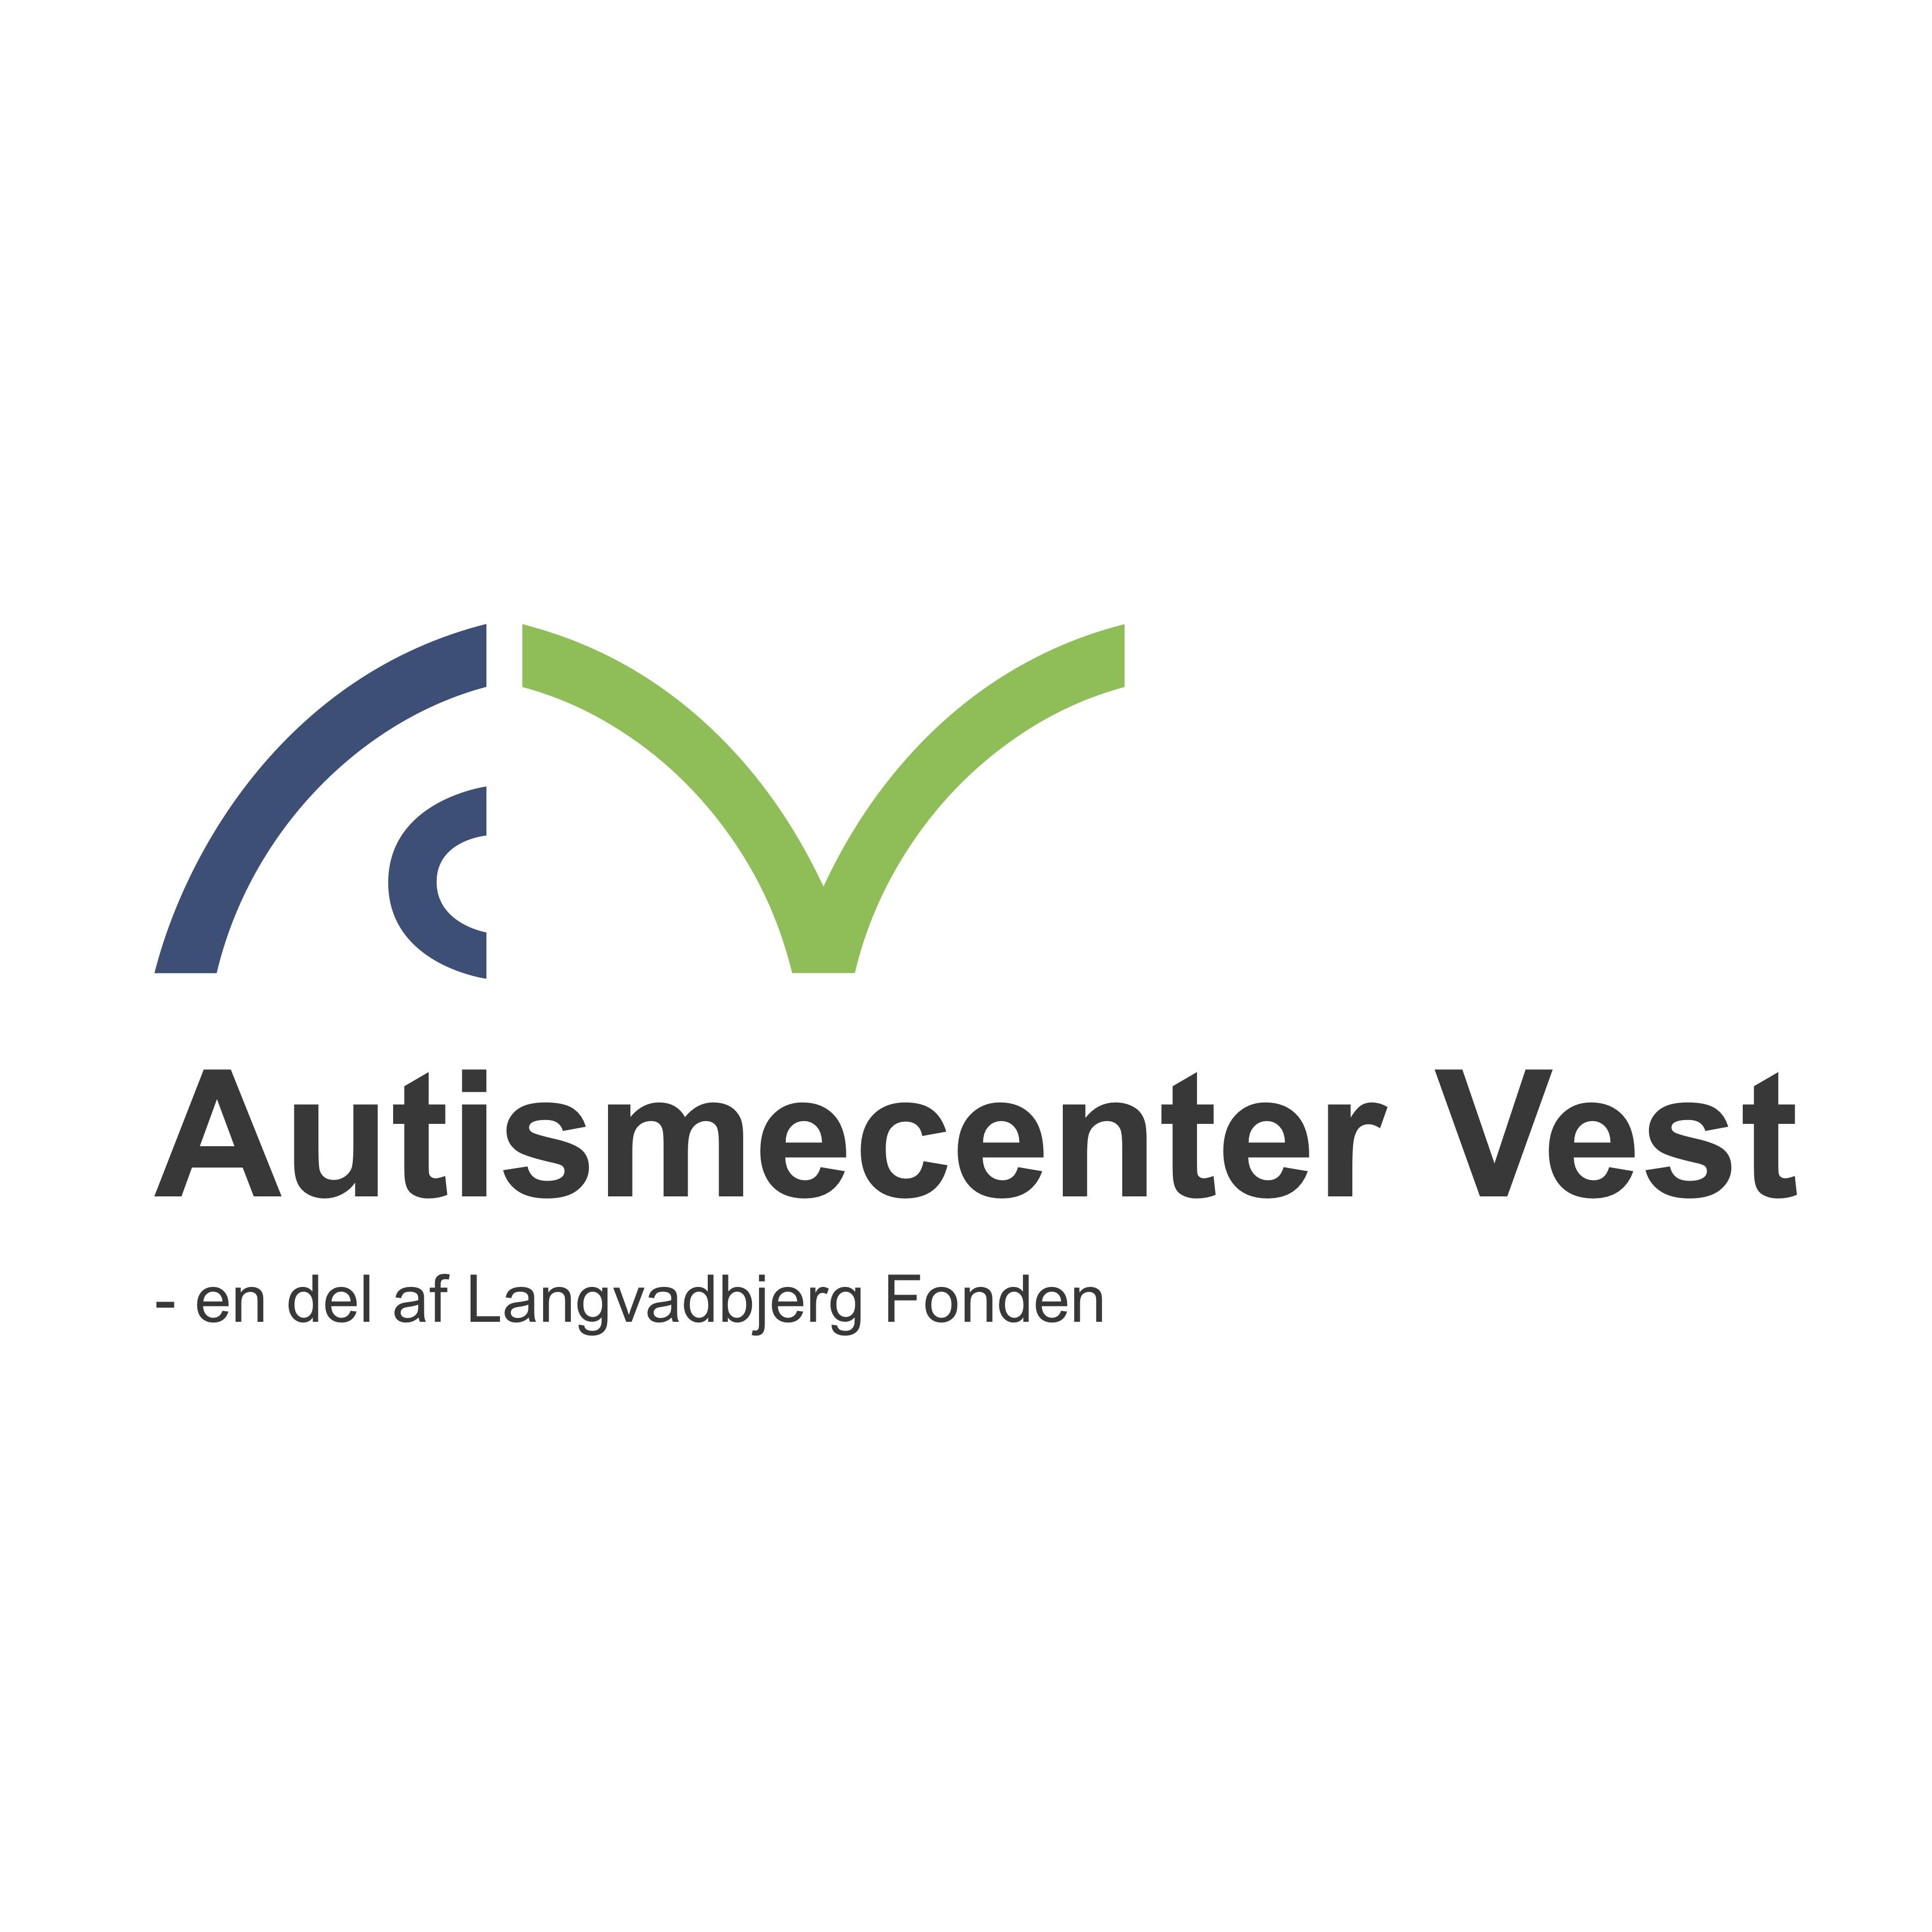 Autismecenter Vest